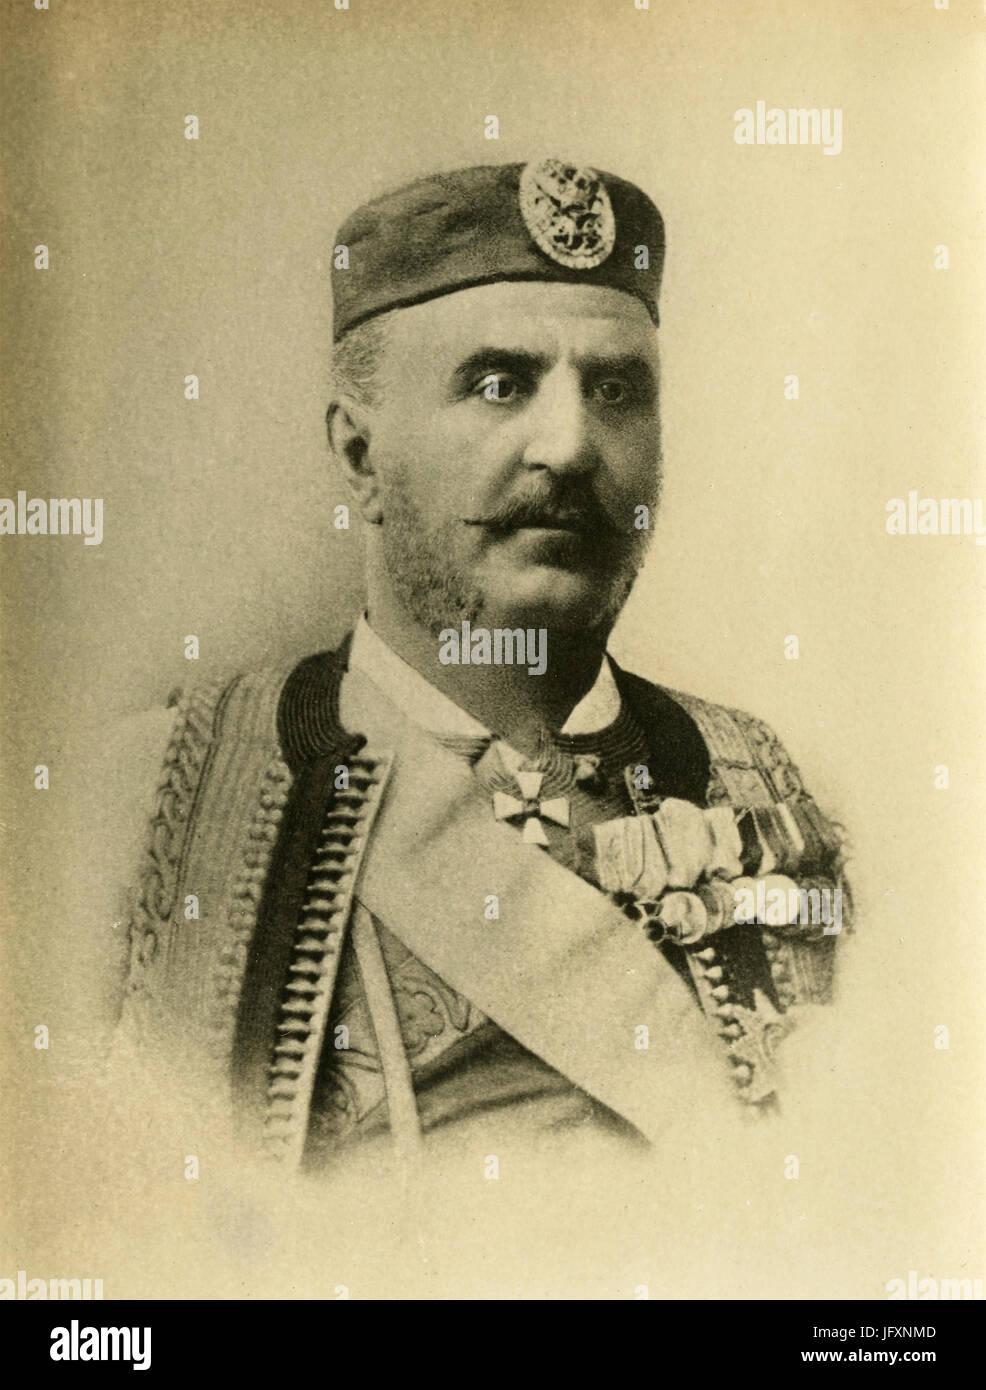 Nicholas I of Montenegro crown prince